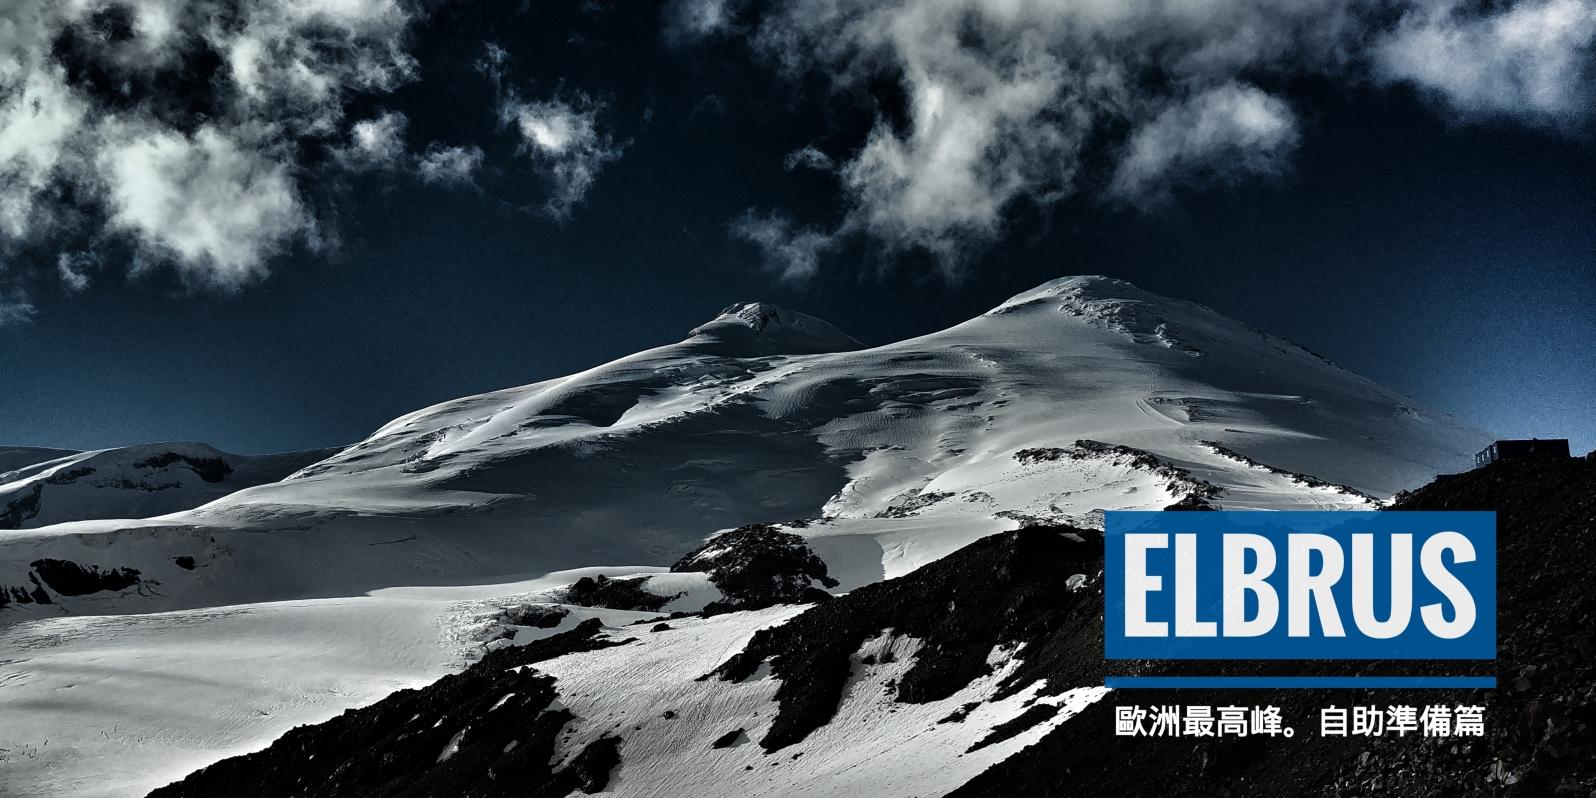 [俄羅斯] 歐洲最高峰·厄爾布魯斯-自助費用、裝備、季節、保險、行程、旅行社 https://justgotraveler.blog/2018/08/26/preparation-for-elbrus-the-highest-mount-in-europe-seven-peaks/